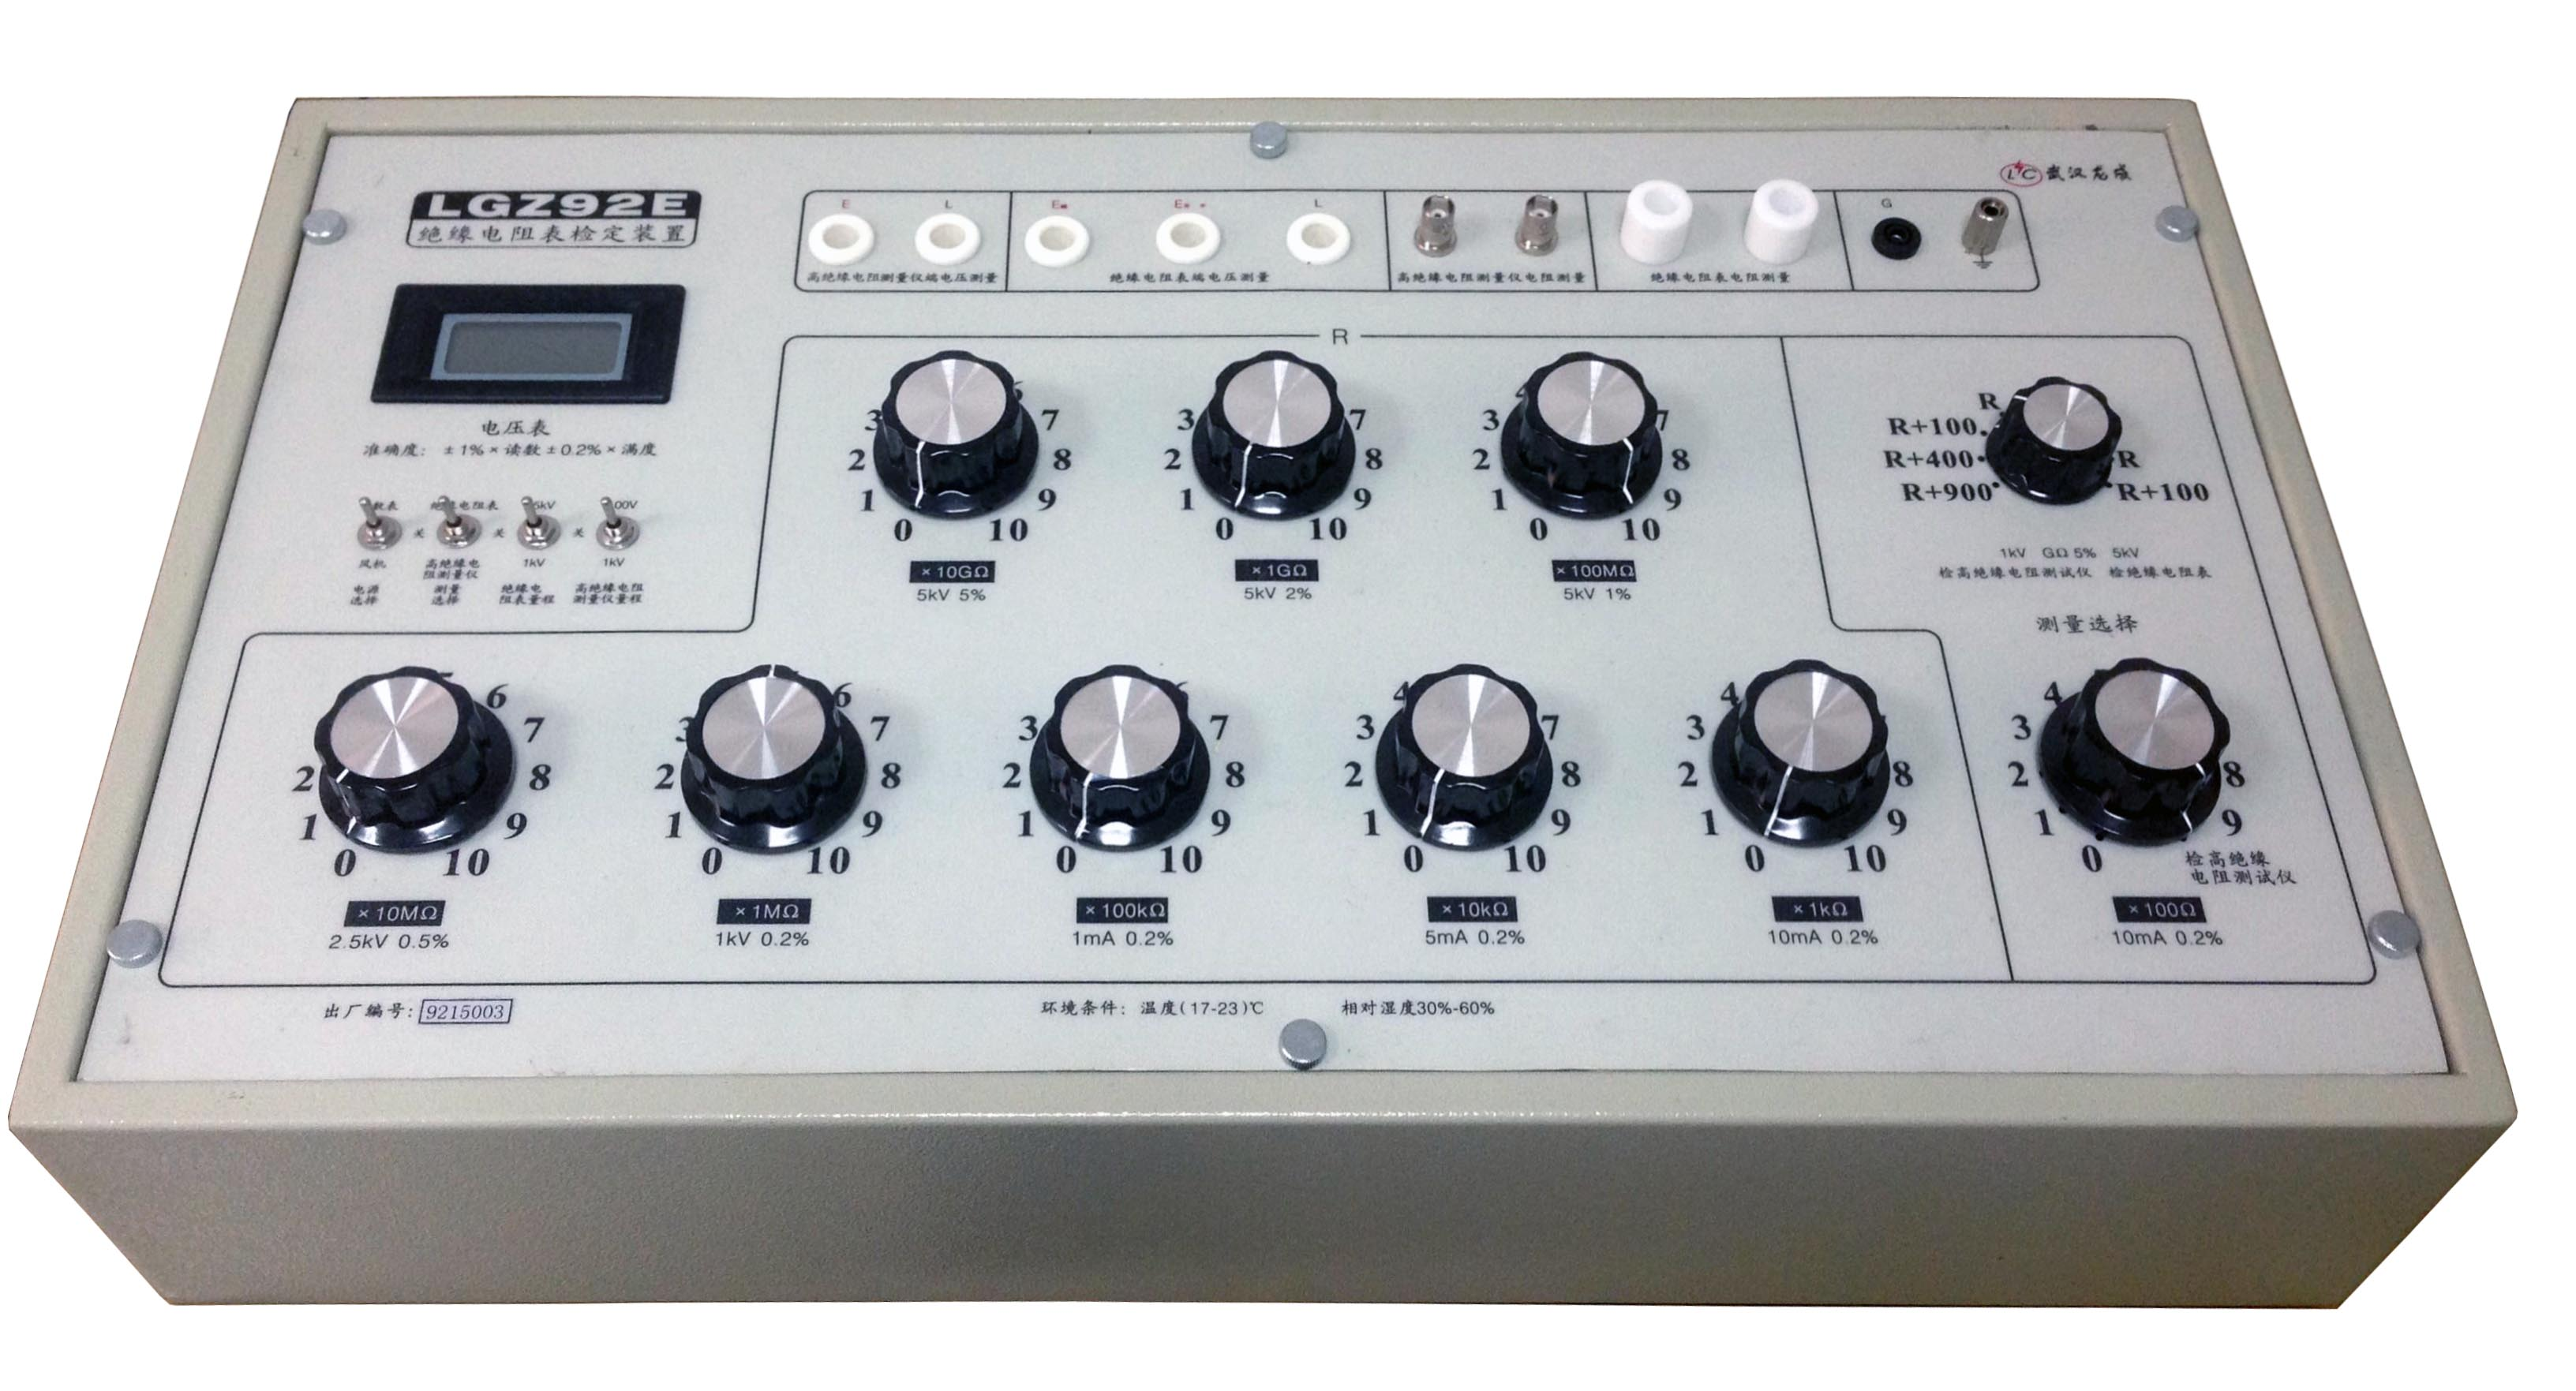 LGZ92E绝缘电阻表检定装置 张丹18064005625 一、技术指标 1. 等级及工作电压(电流) 1.1 电阻输出部分 1.1.1 可调电阻(共用电阻)部分 阻 值 10G 1G 100M 10M 1M 准确度等级 5 2 1 0.5 0.2 标称电压 5000V 5000V 5000V 2500V 1000V 阻 值 100k 10k 1k 100 准确度等级 0.2 0.